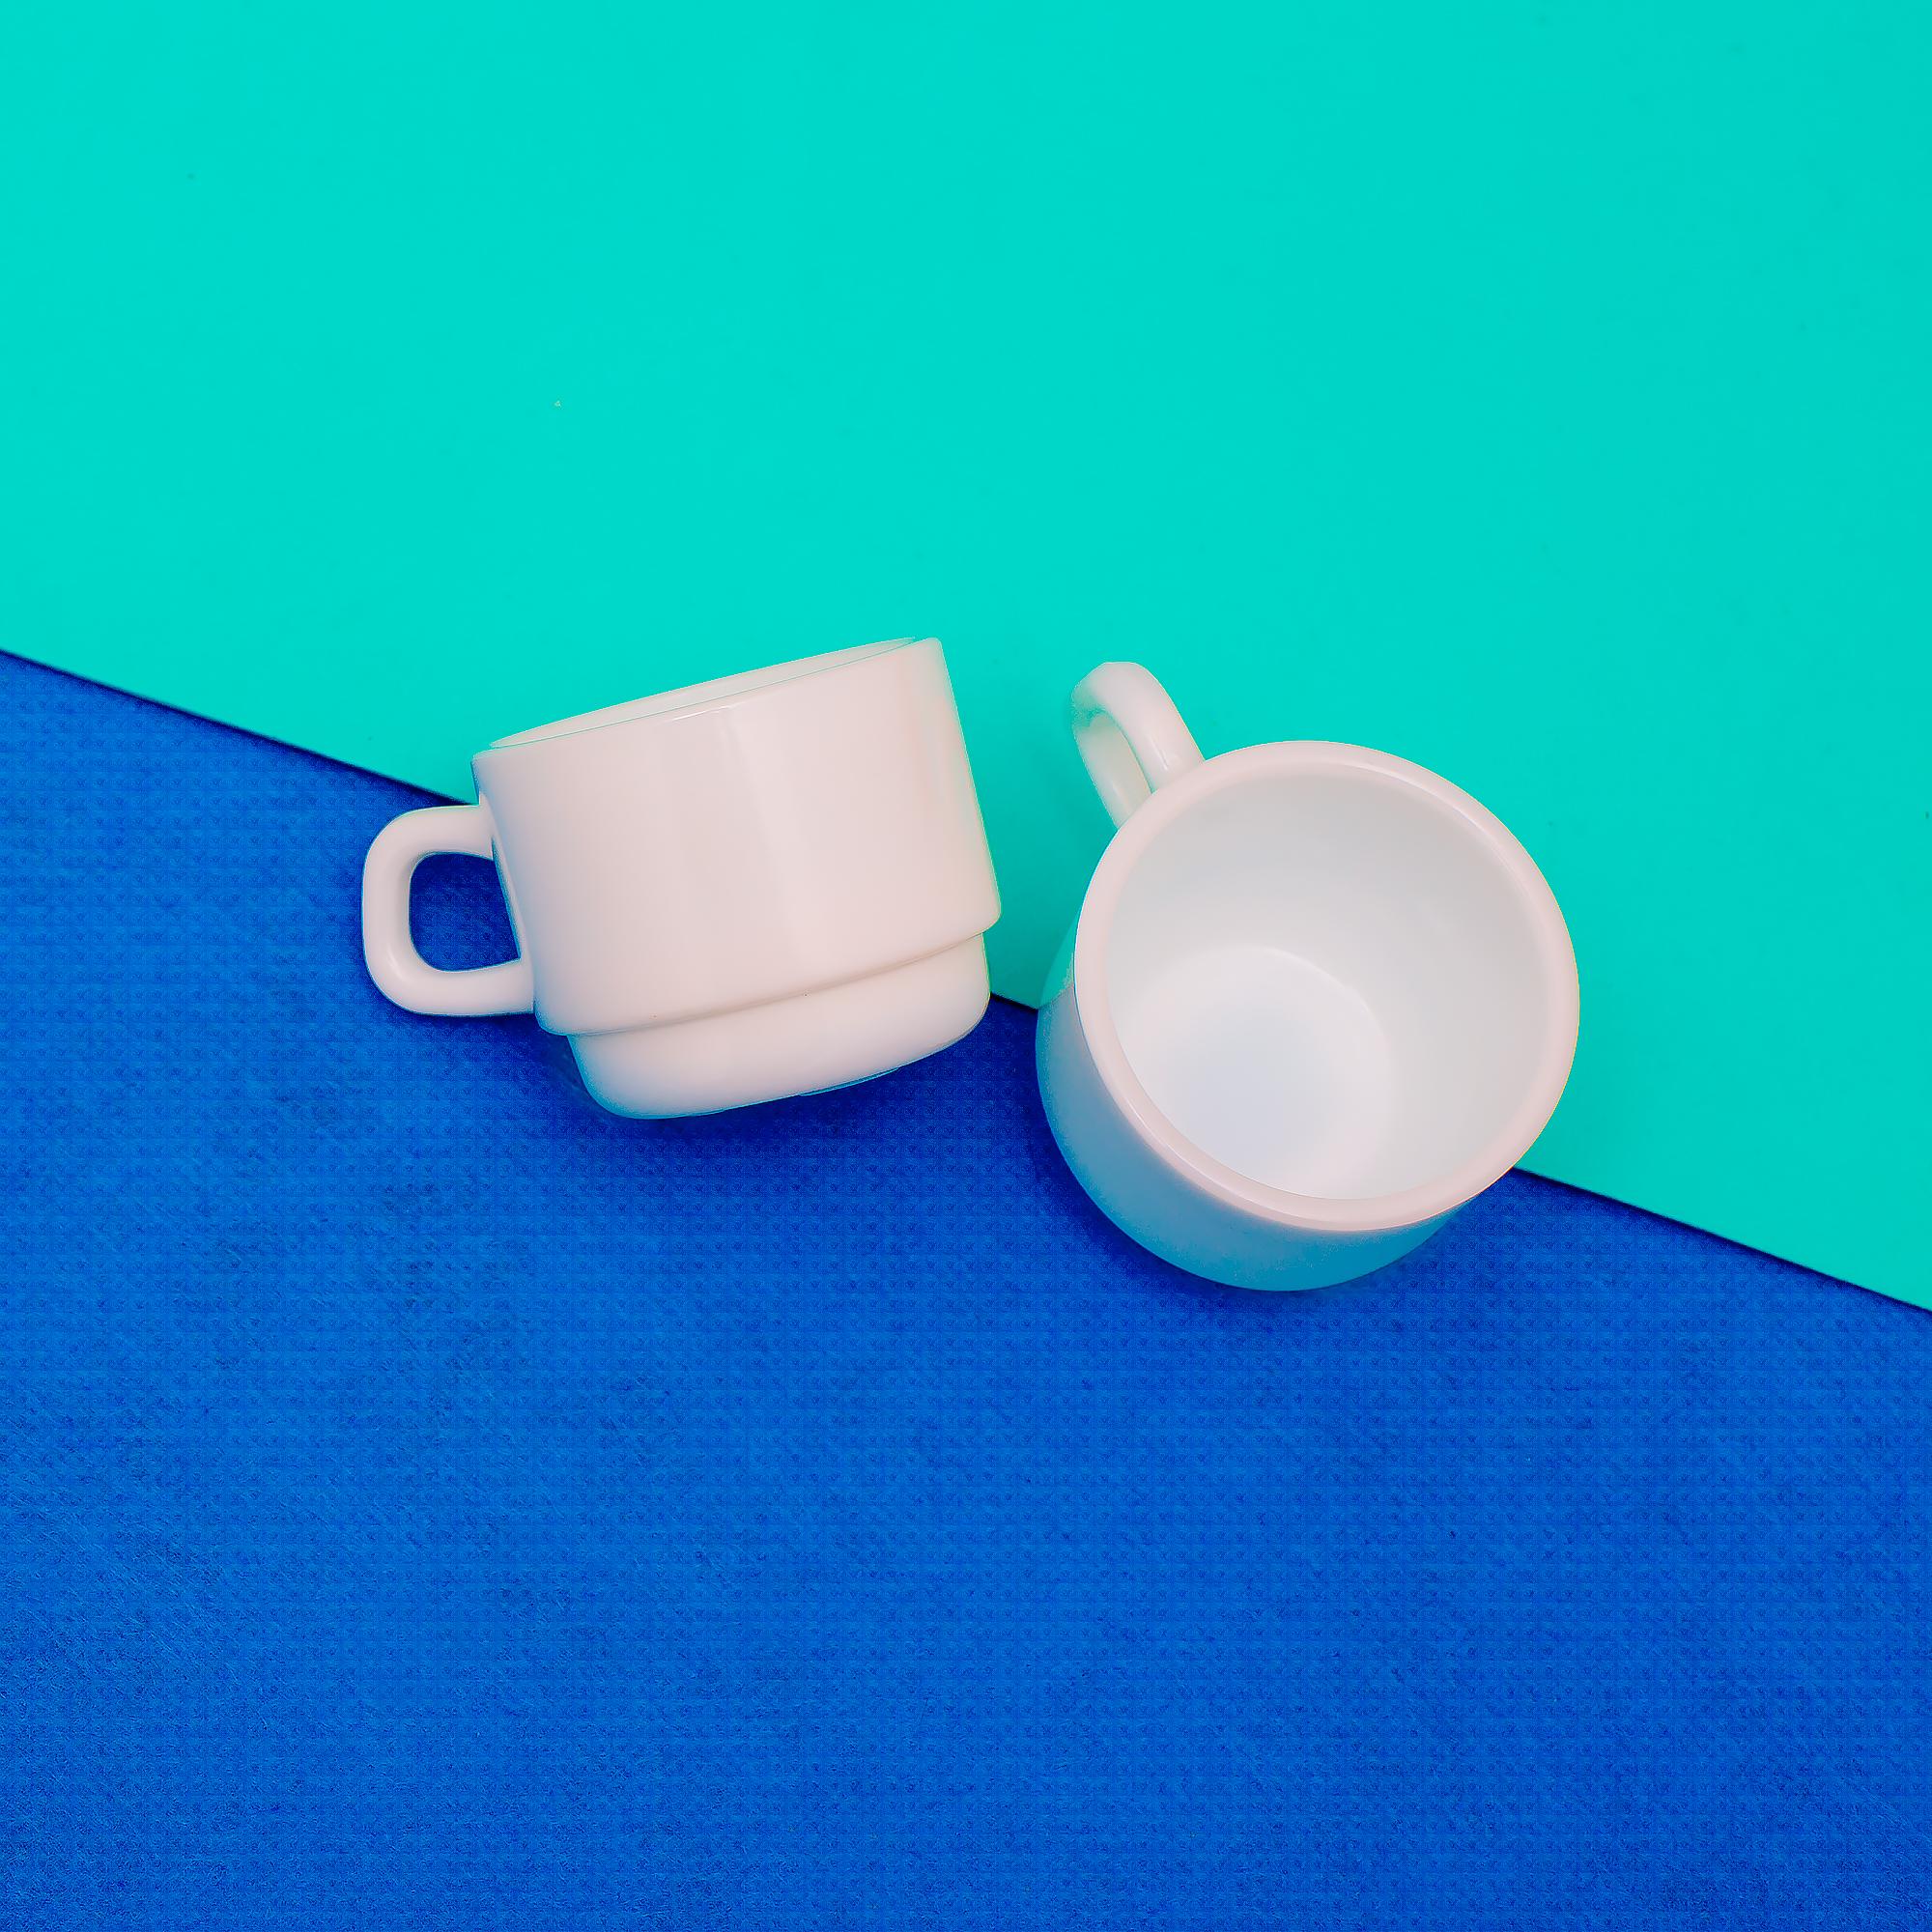 coffeecups_boringgraphics.jpg